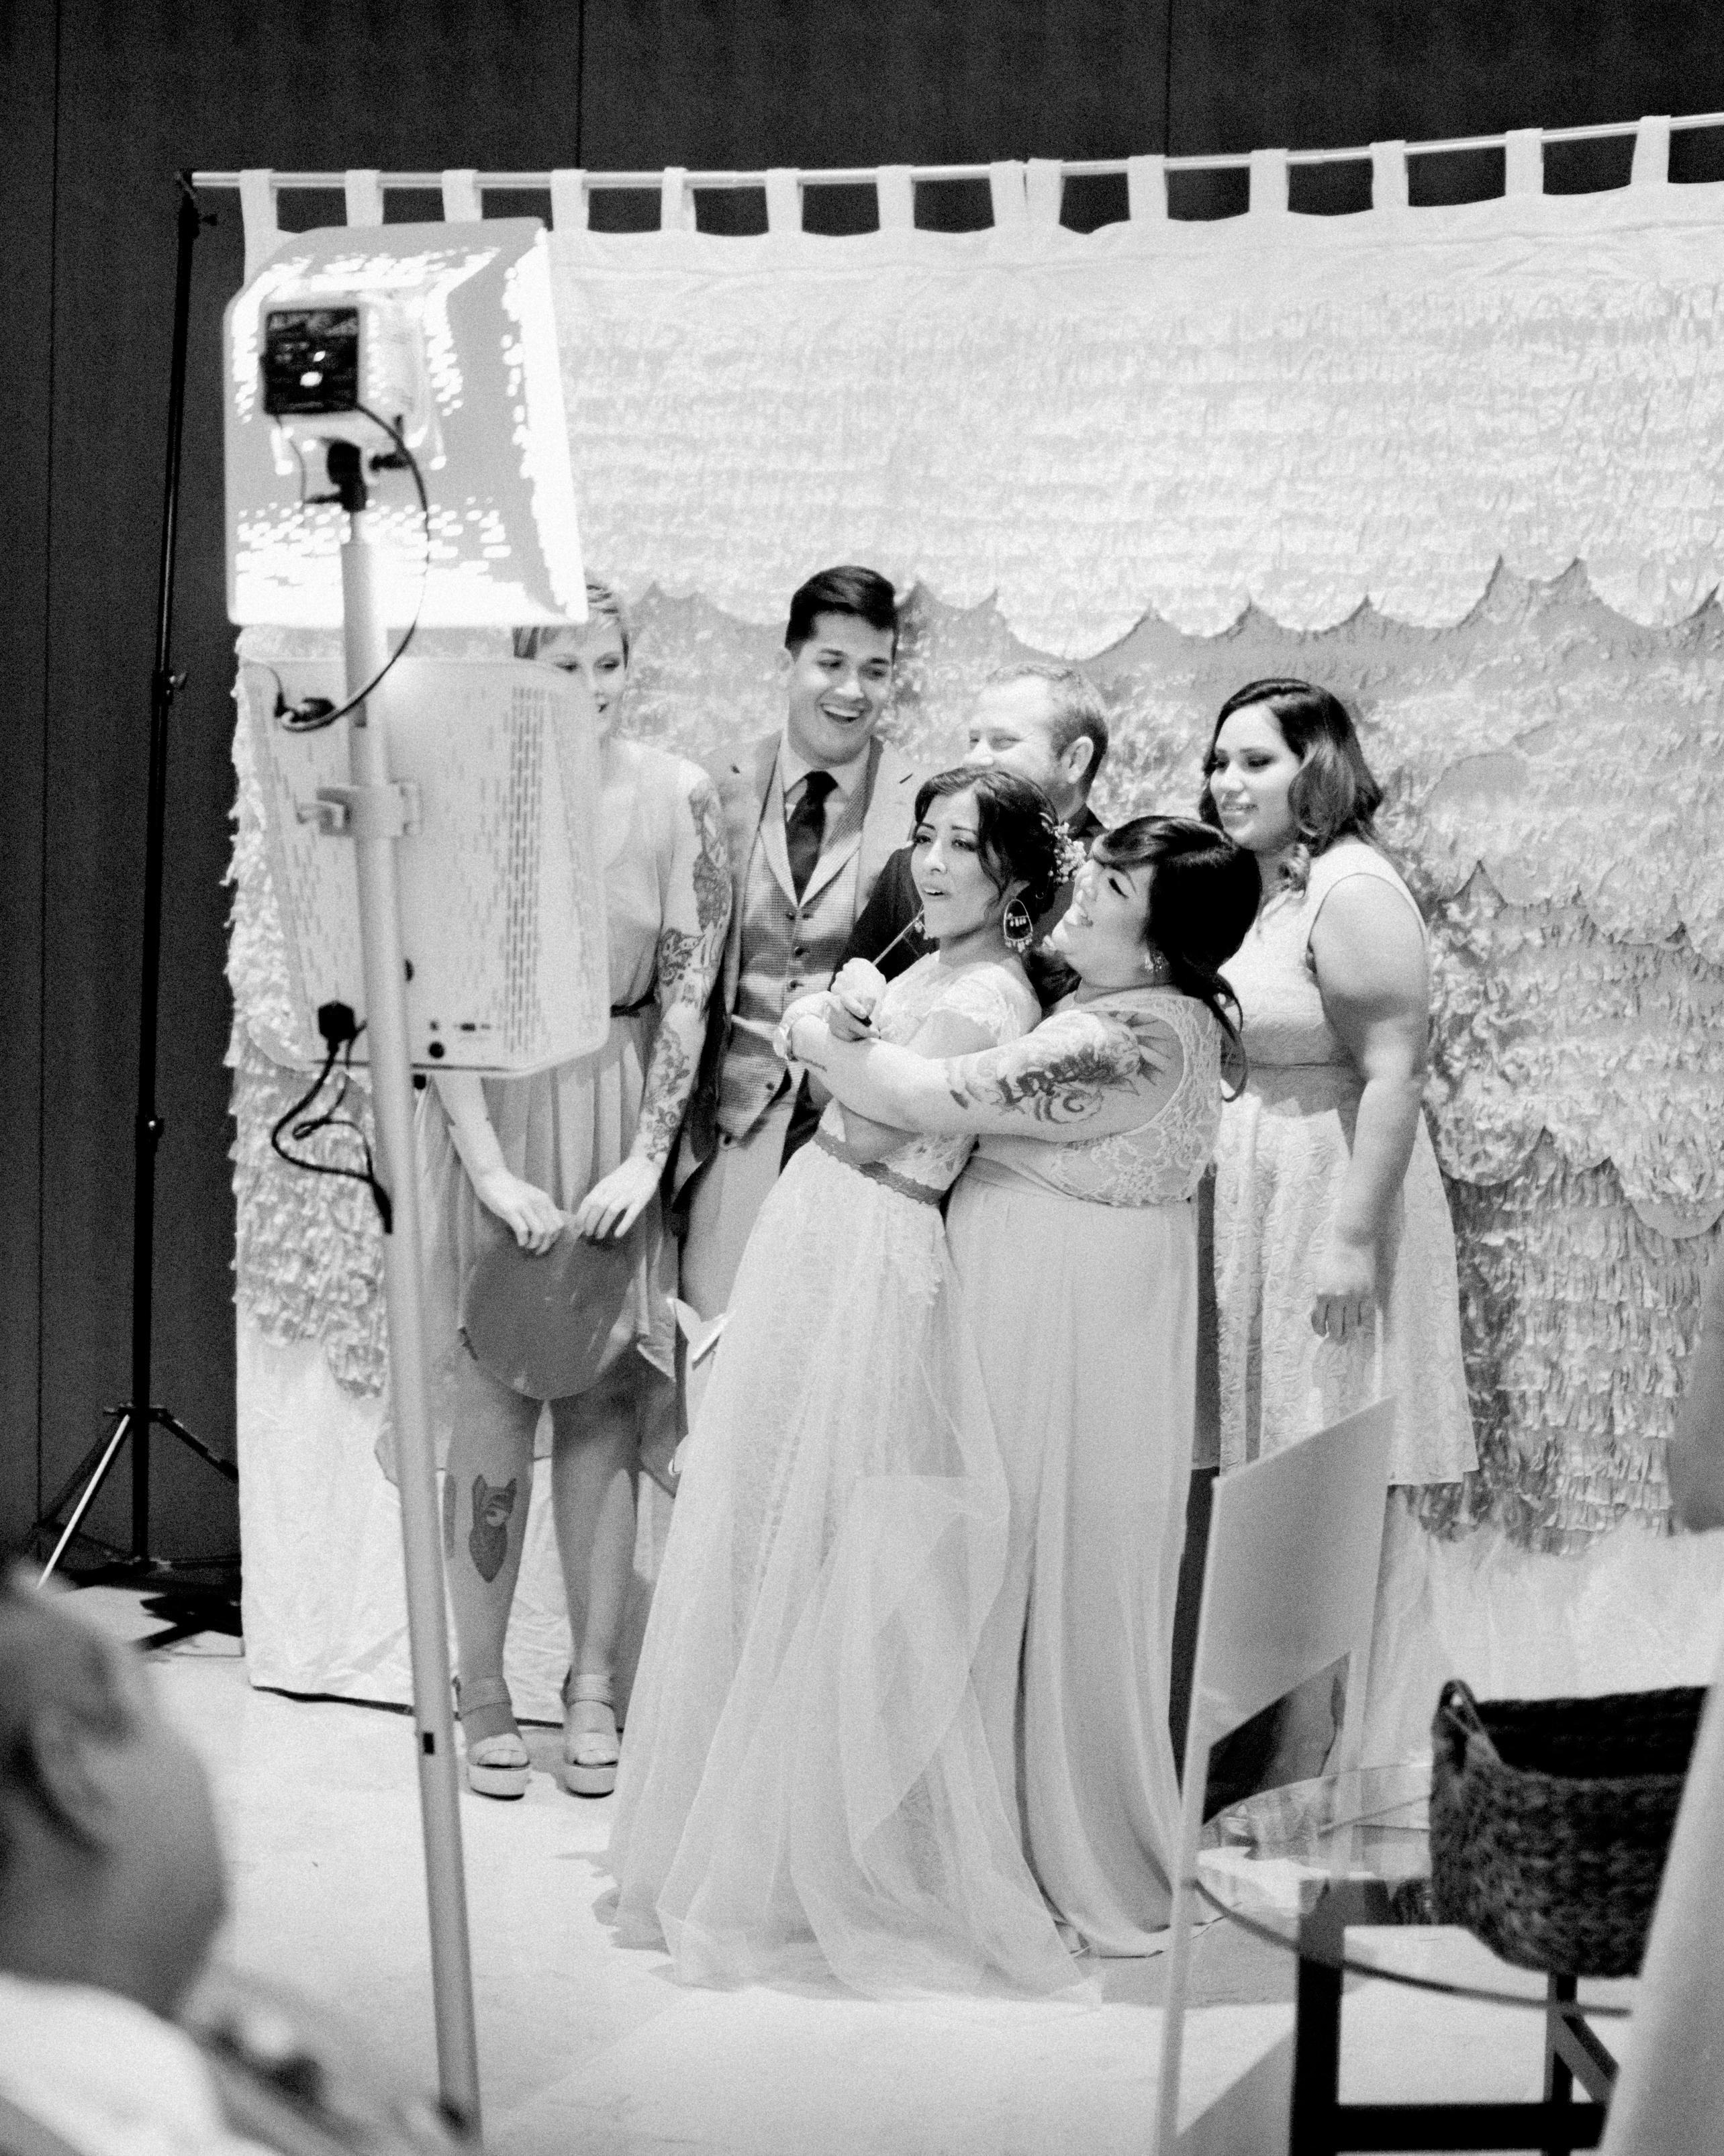 atalia-raul-wedding-photobooth-73-s112395-1215.jpg